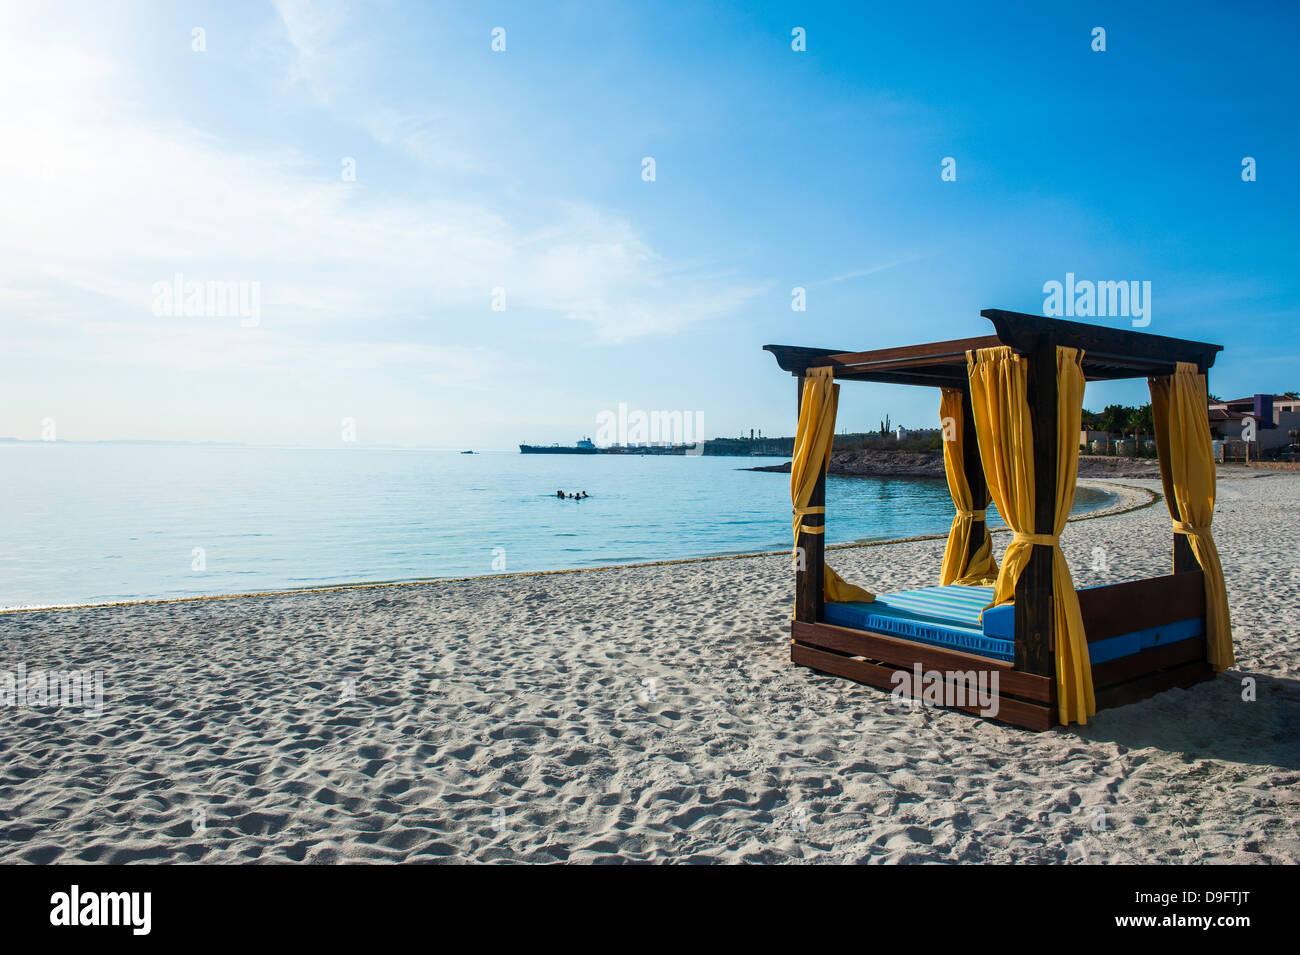 Huge double bed on the beach of Playa Palmira near La Paz, Baja California, Mexico - Stock Image